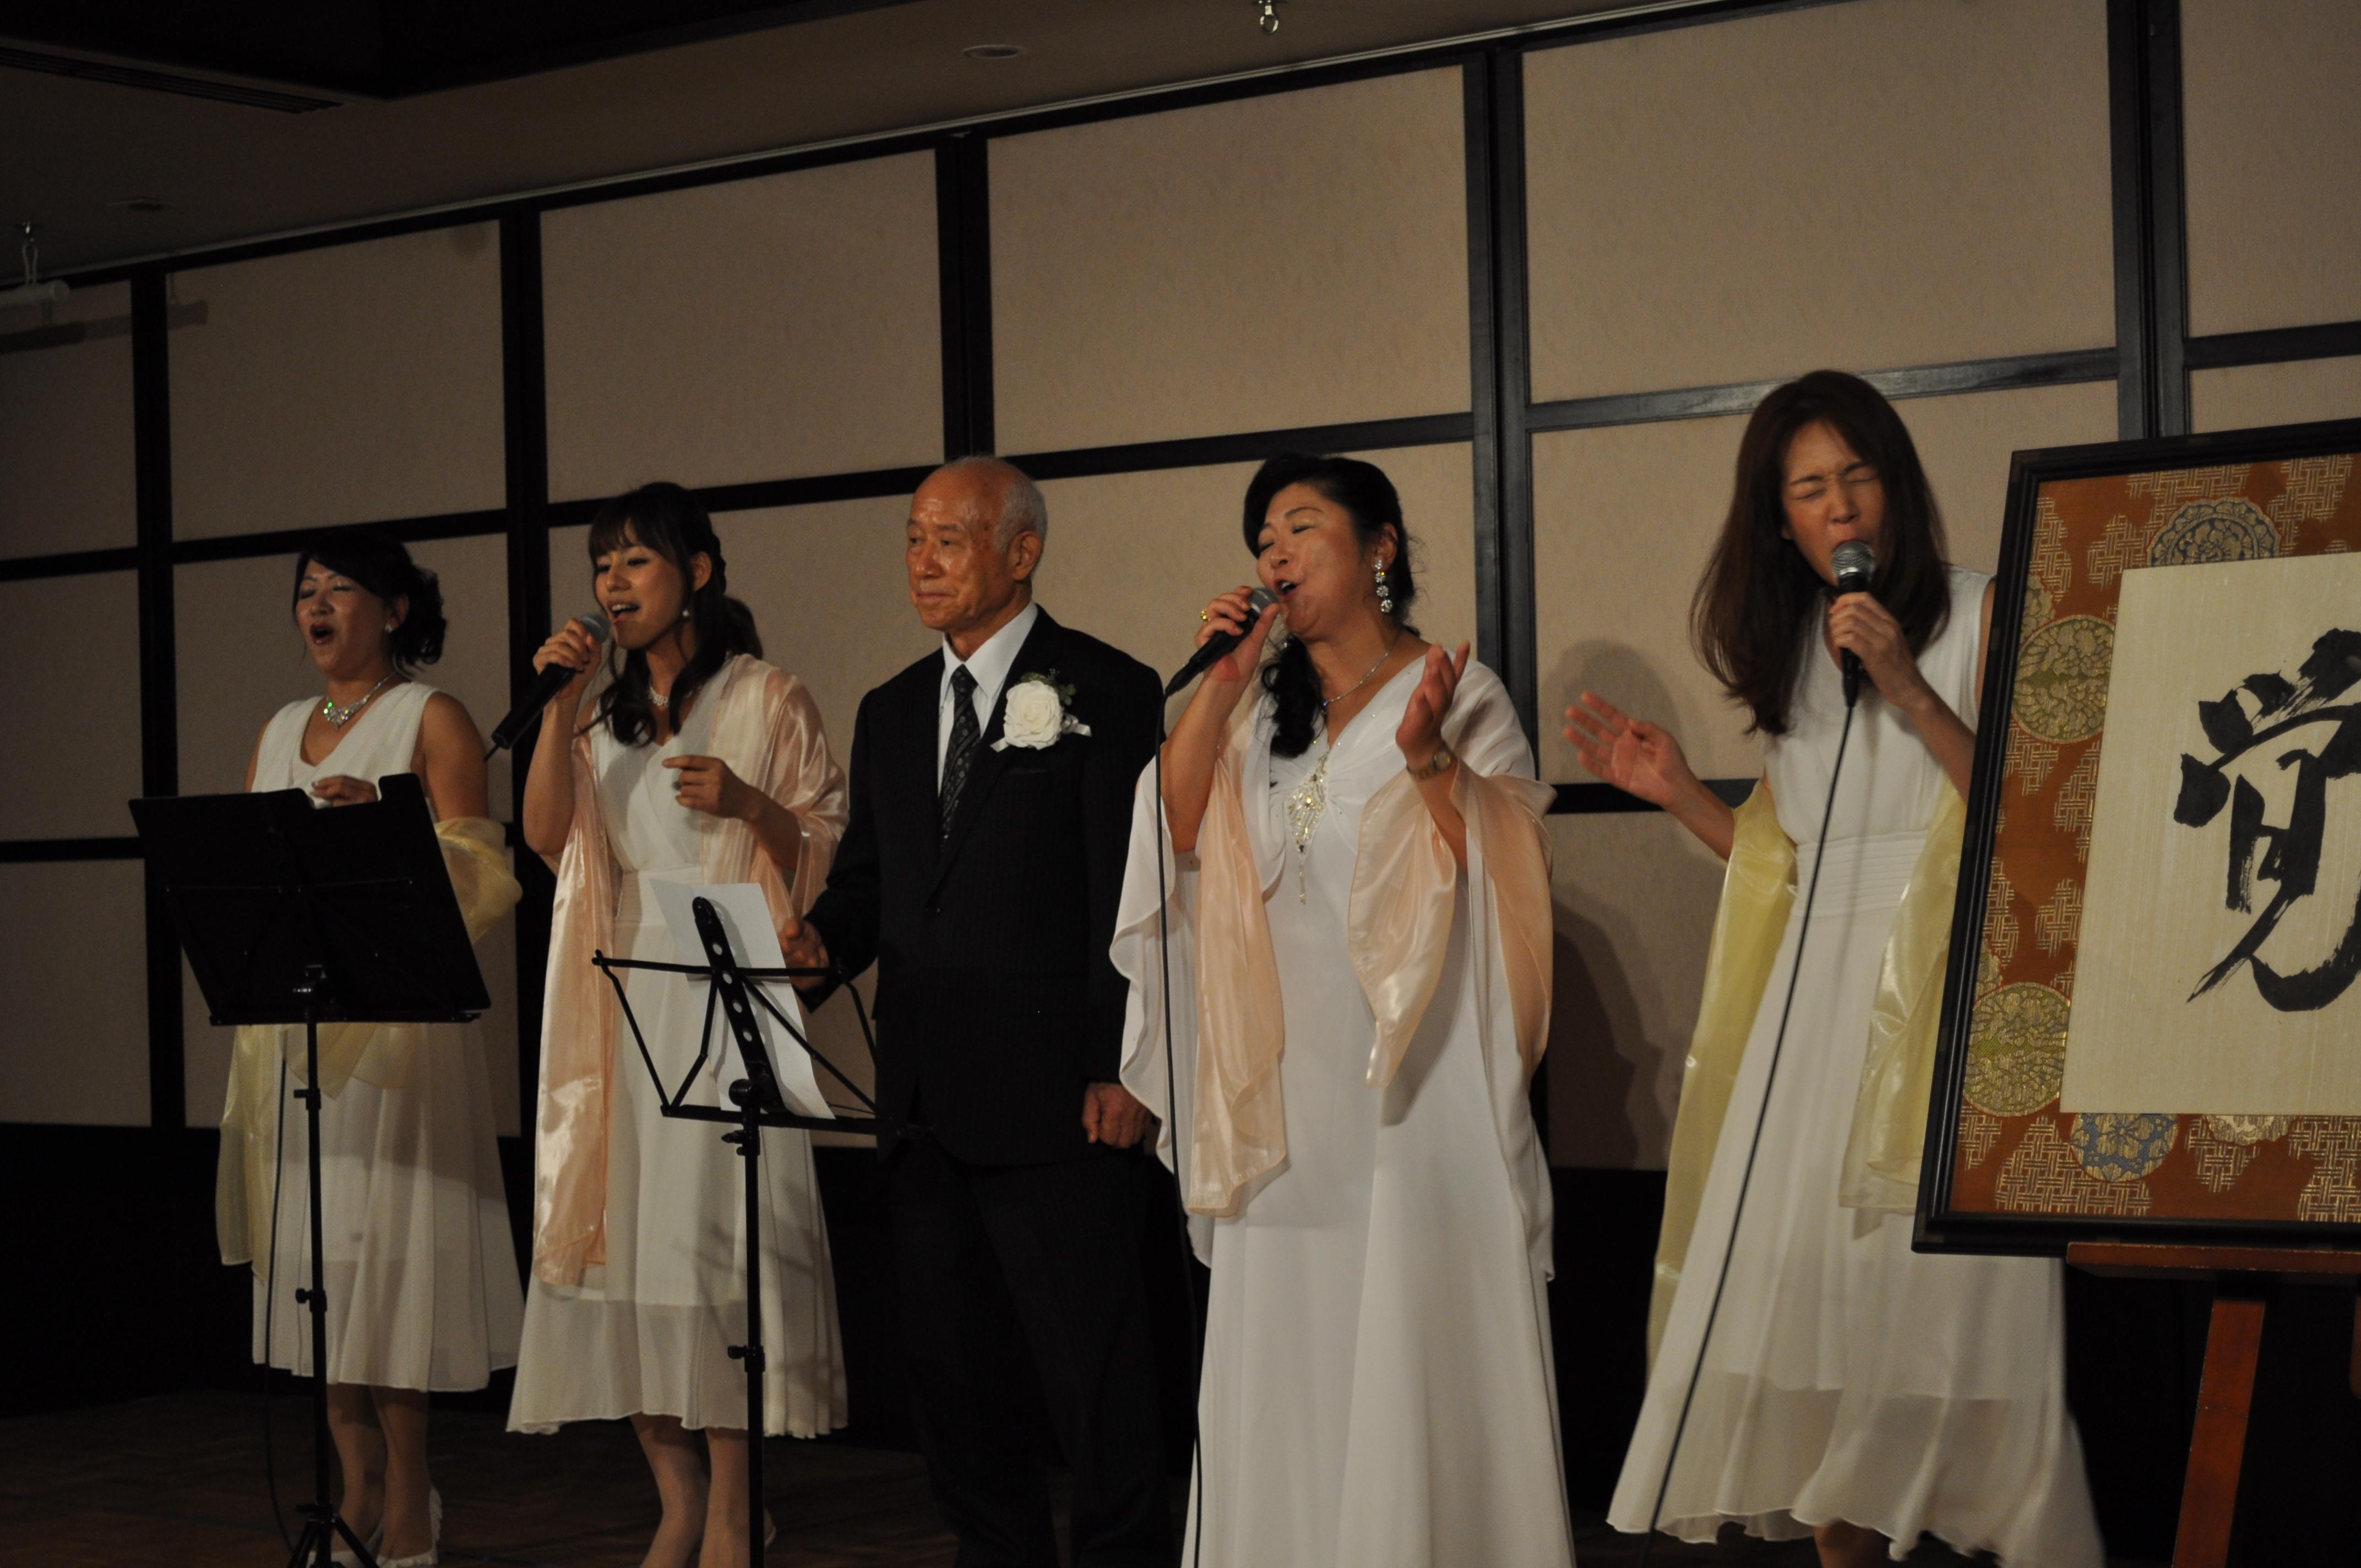 DSC 0526 - 第6回思風会全国大会2018in東京開催